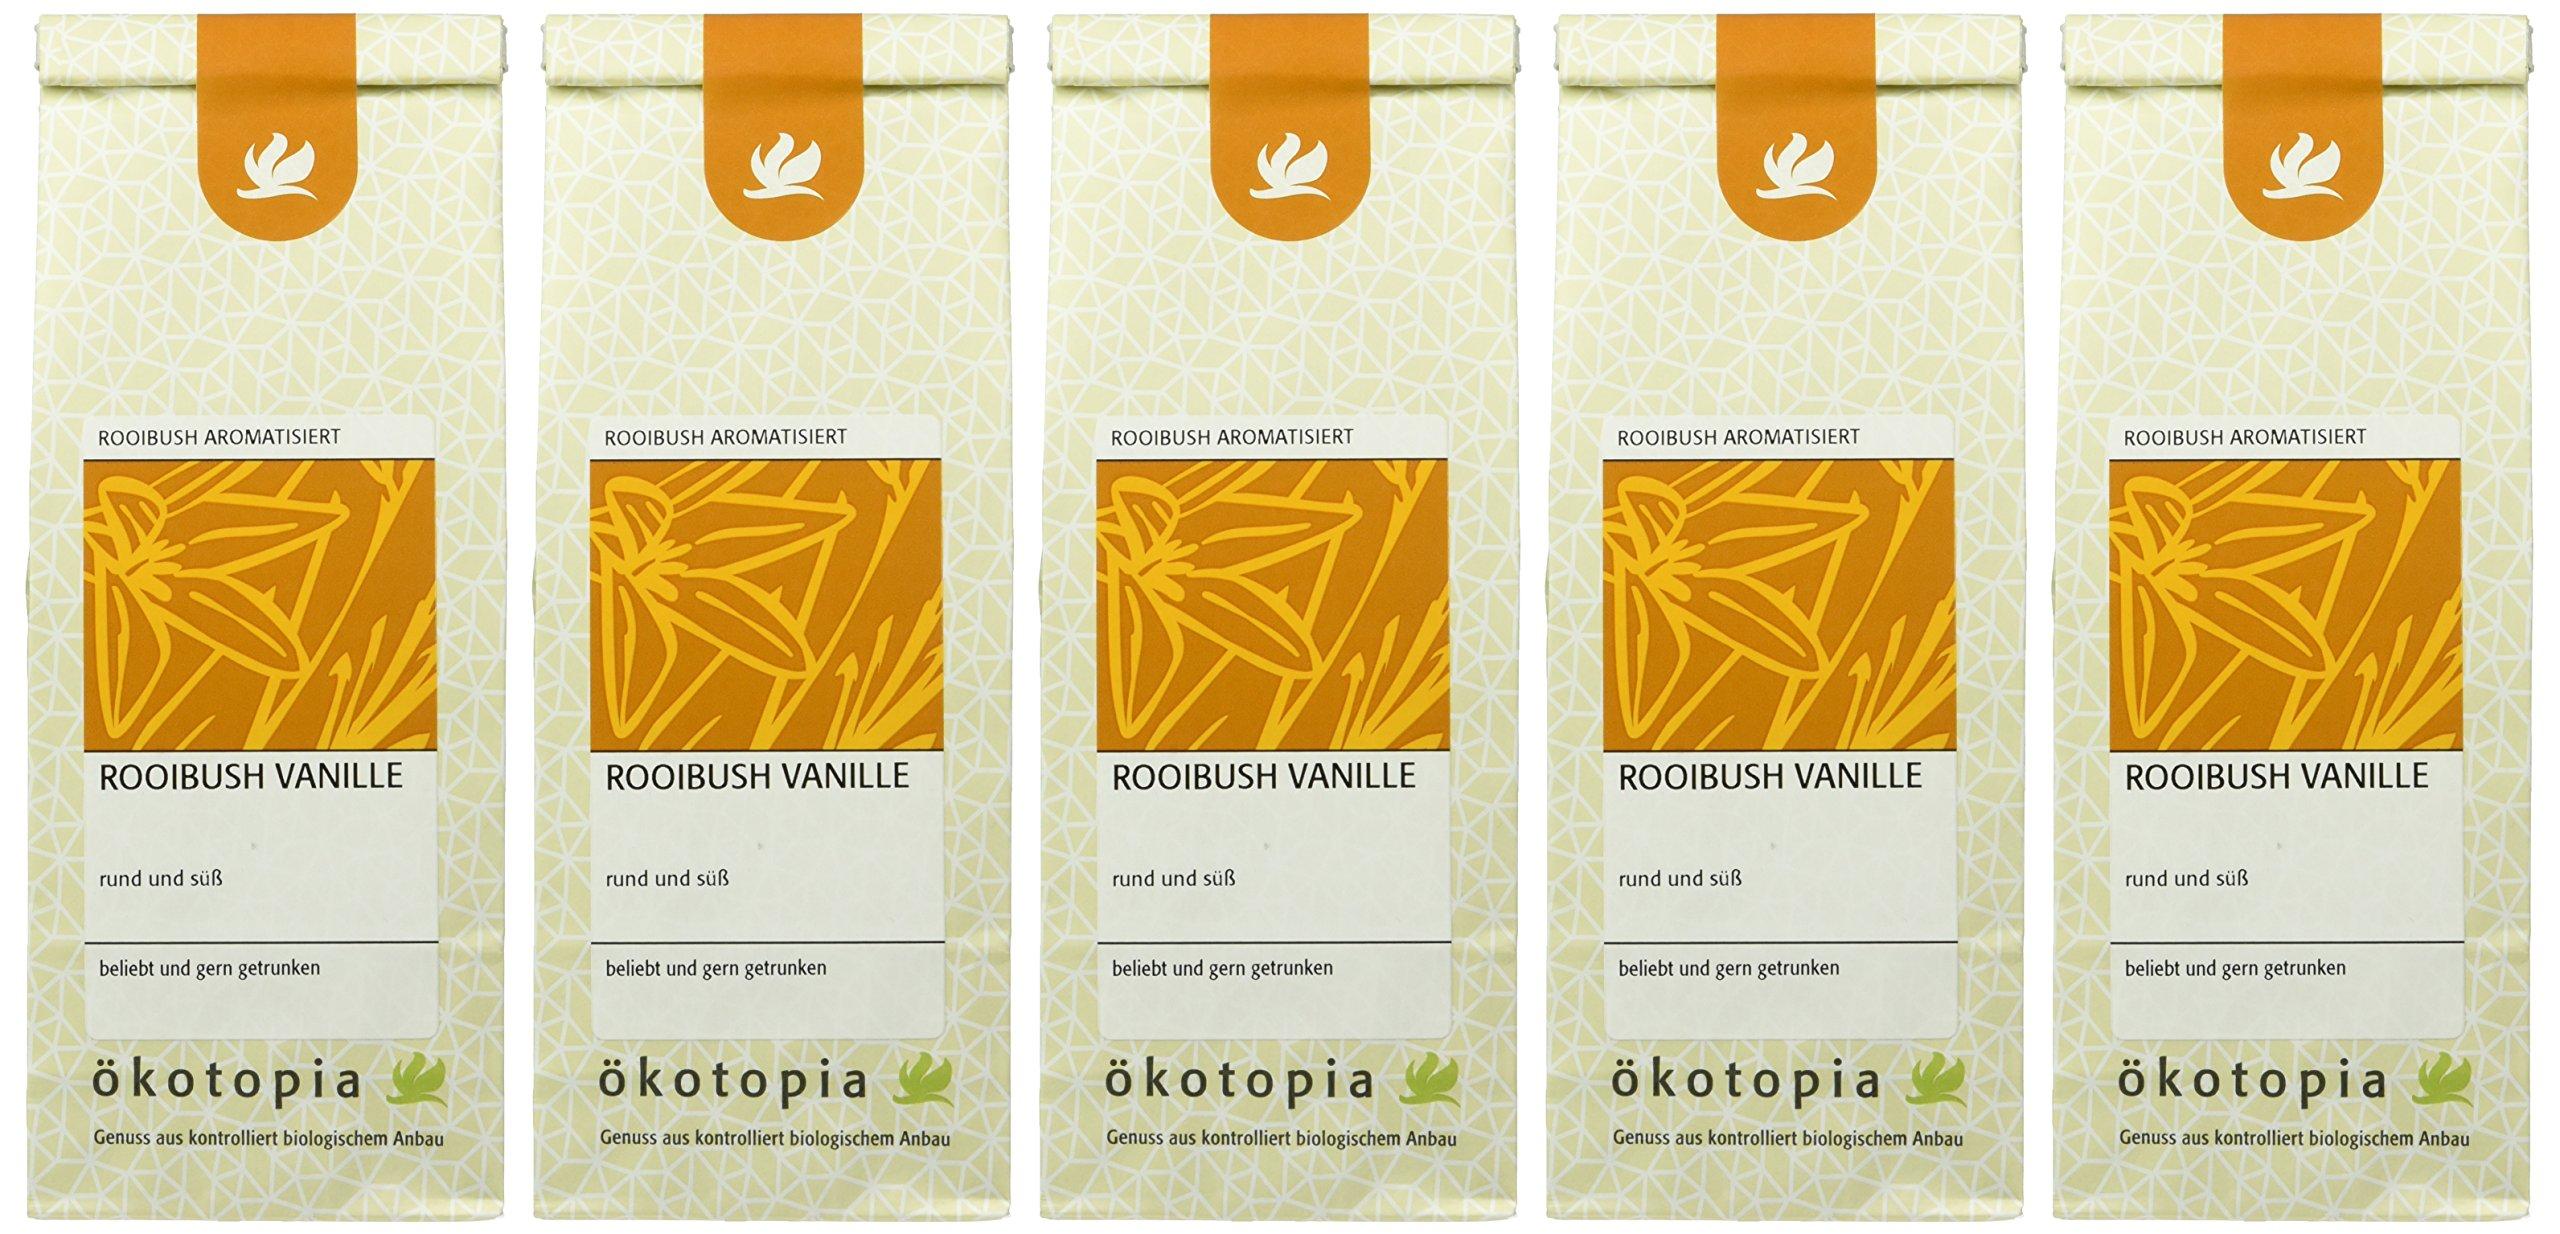 kotopia-Roibusch-Tee-aromatisiert-Rooibush-Vanille-5er-Pack-5-x-100-g